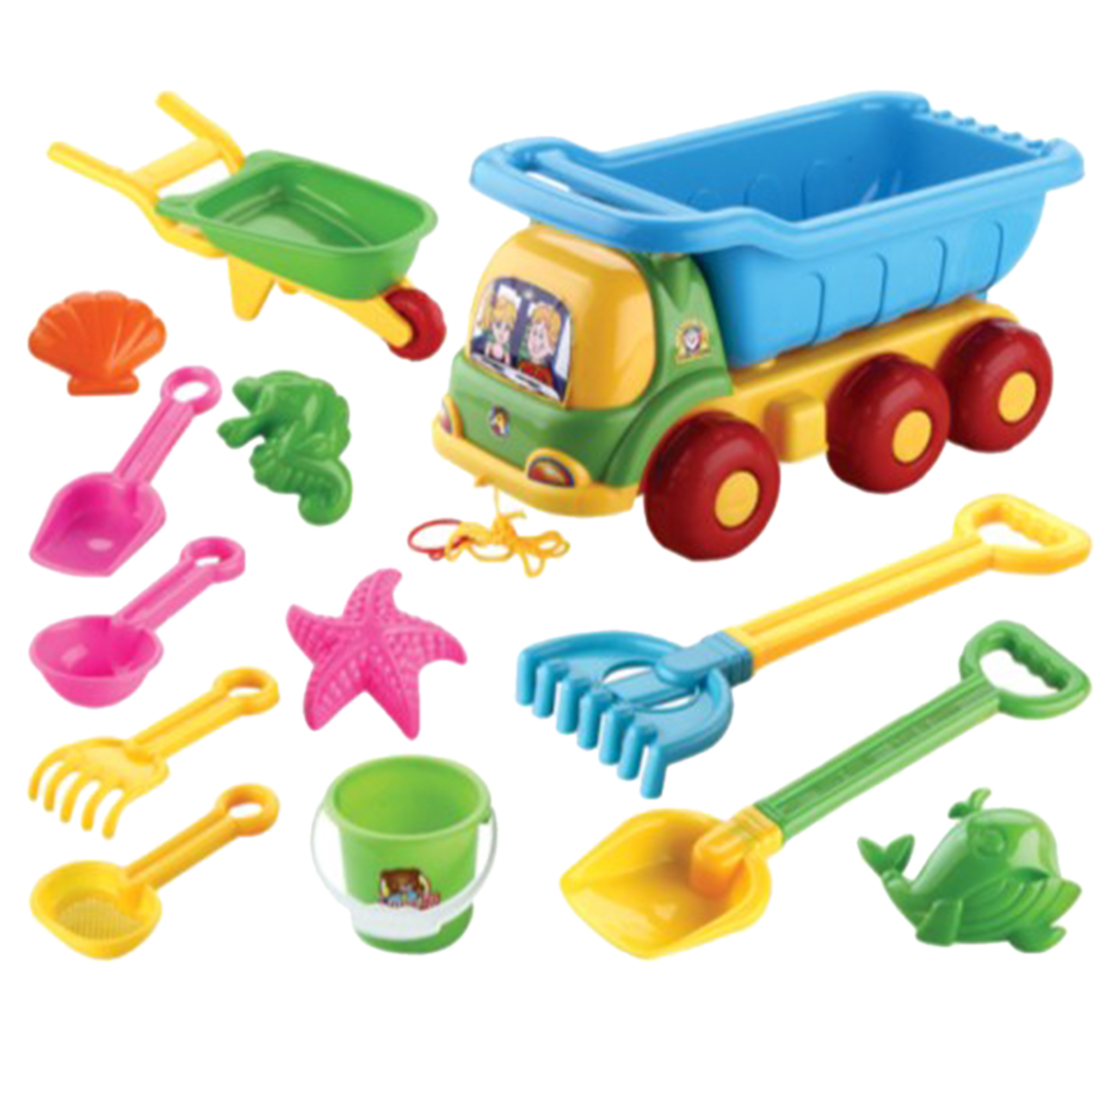 NFSTRIKE 13Pcs Children Outdoor Beach Sand Toy Set Beach Bucket Shovel Wheelbarrow Playset - Color Random